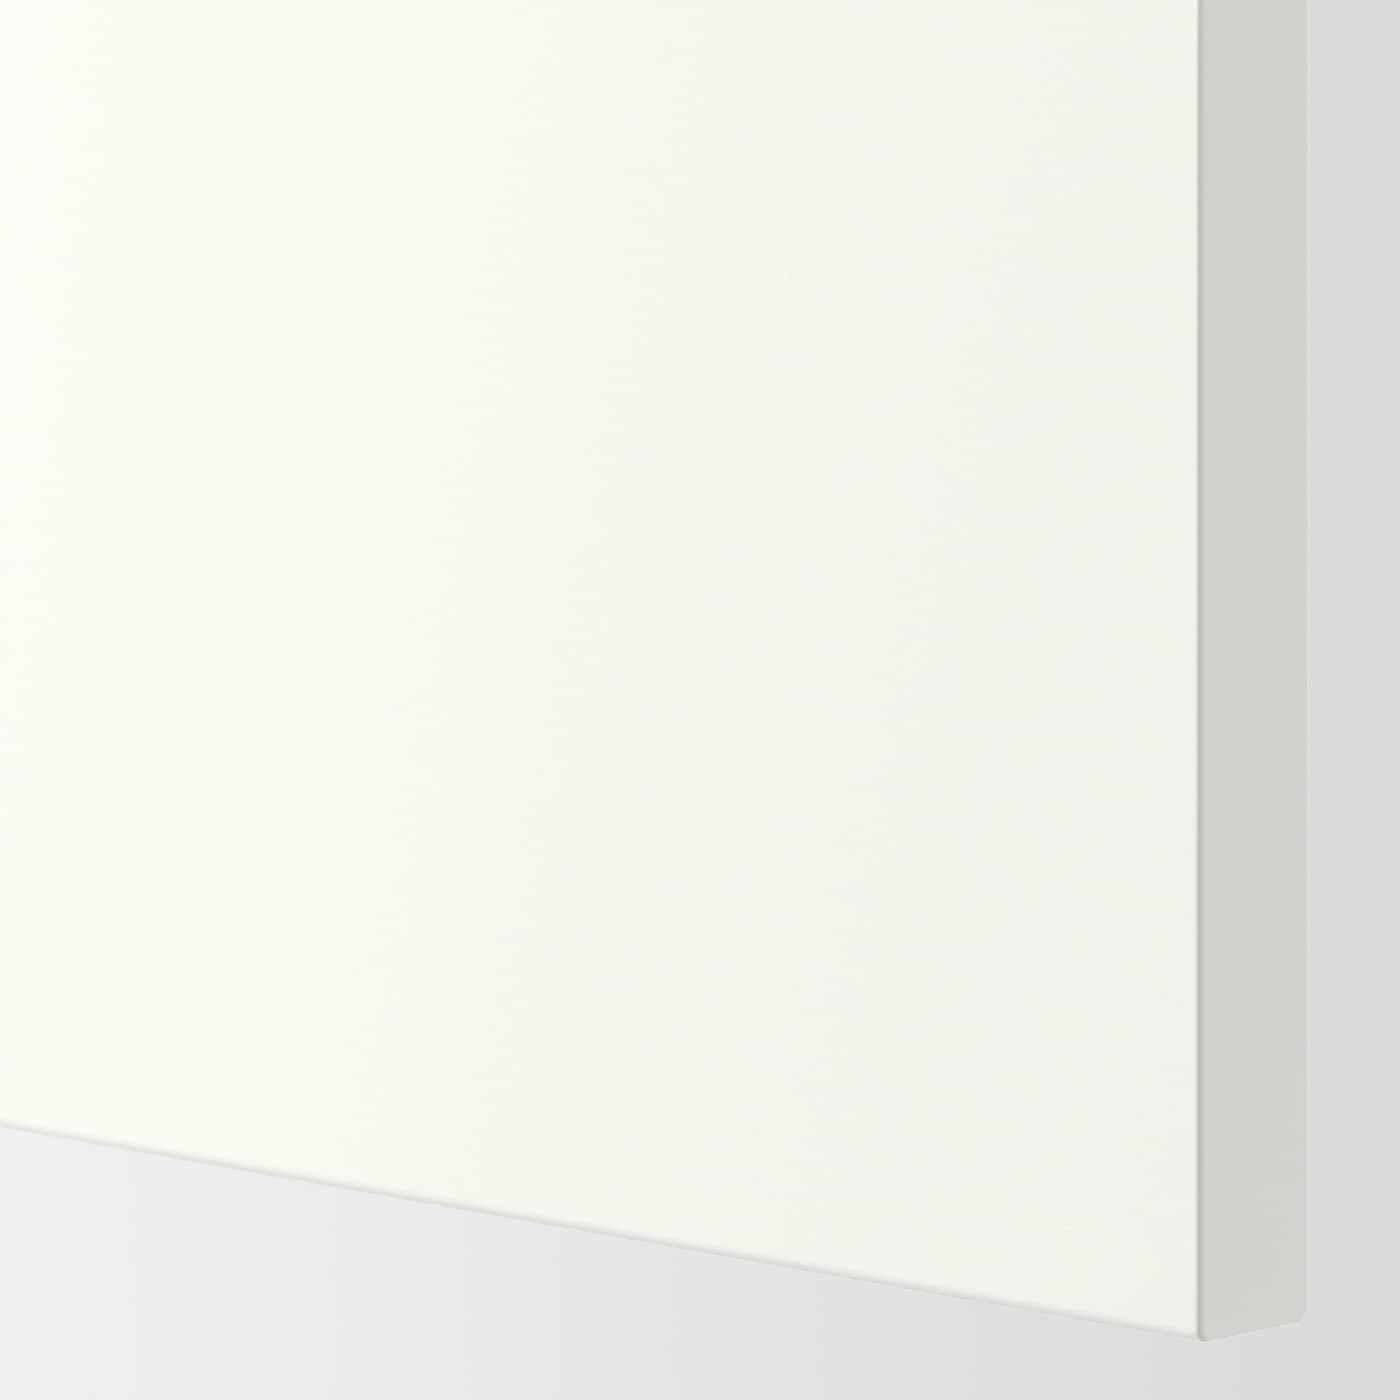 ENHET Wandschrank m 2 Böden/Türen, weiß, 80x30x75 cm